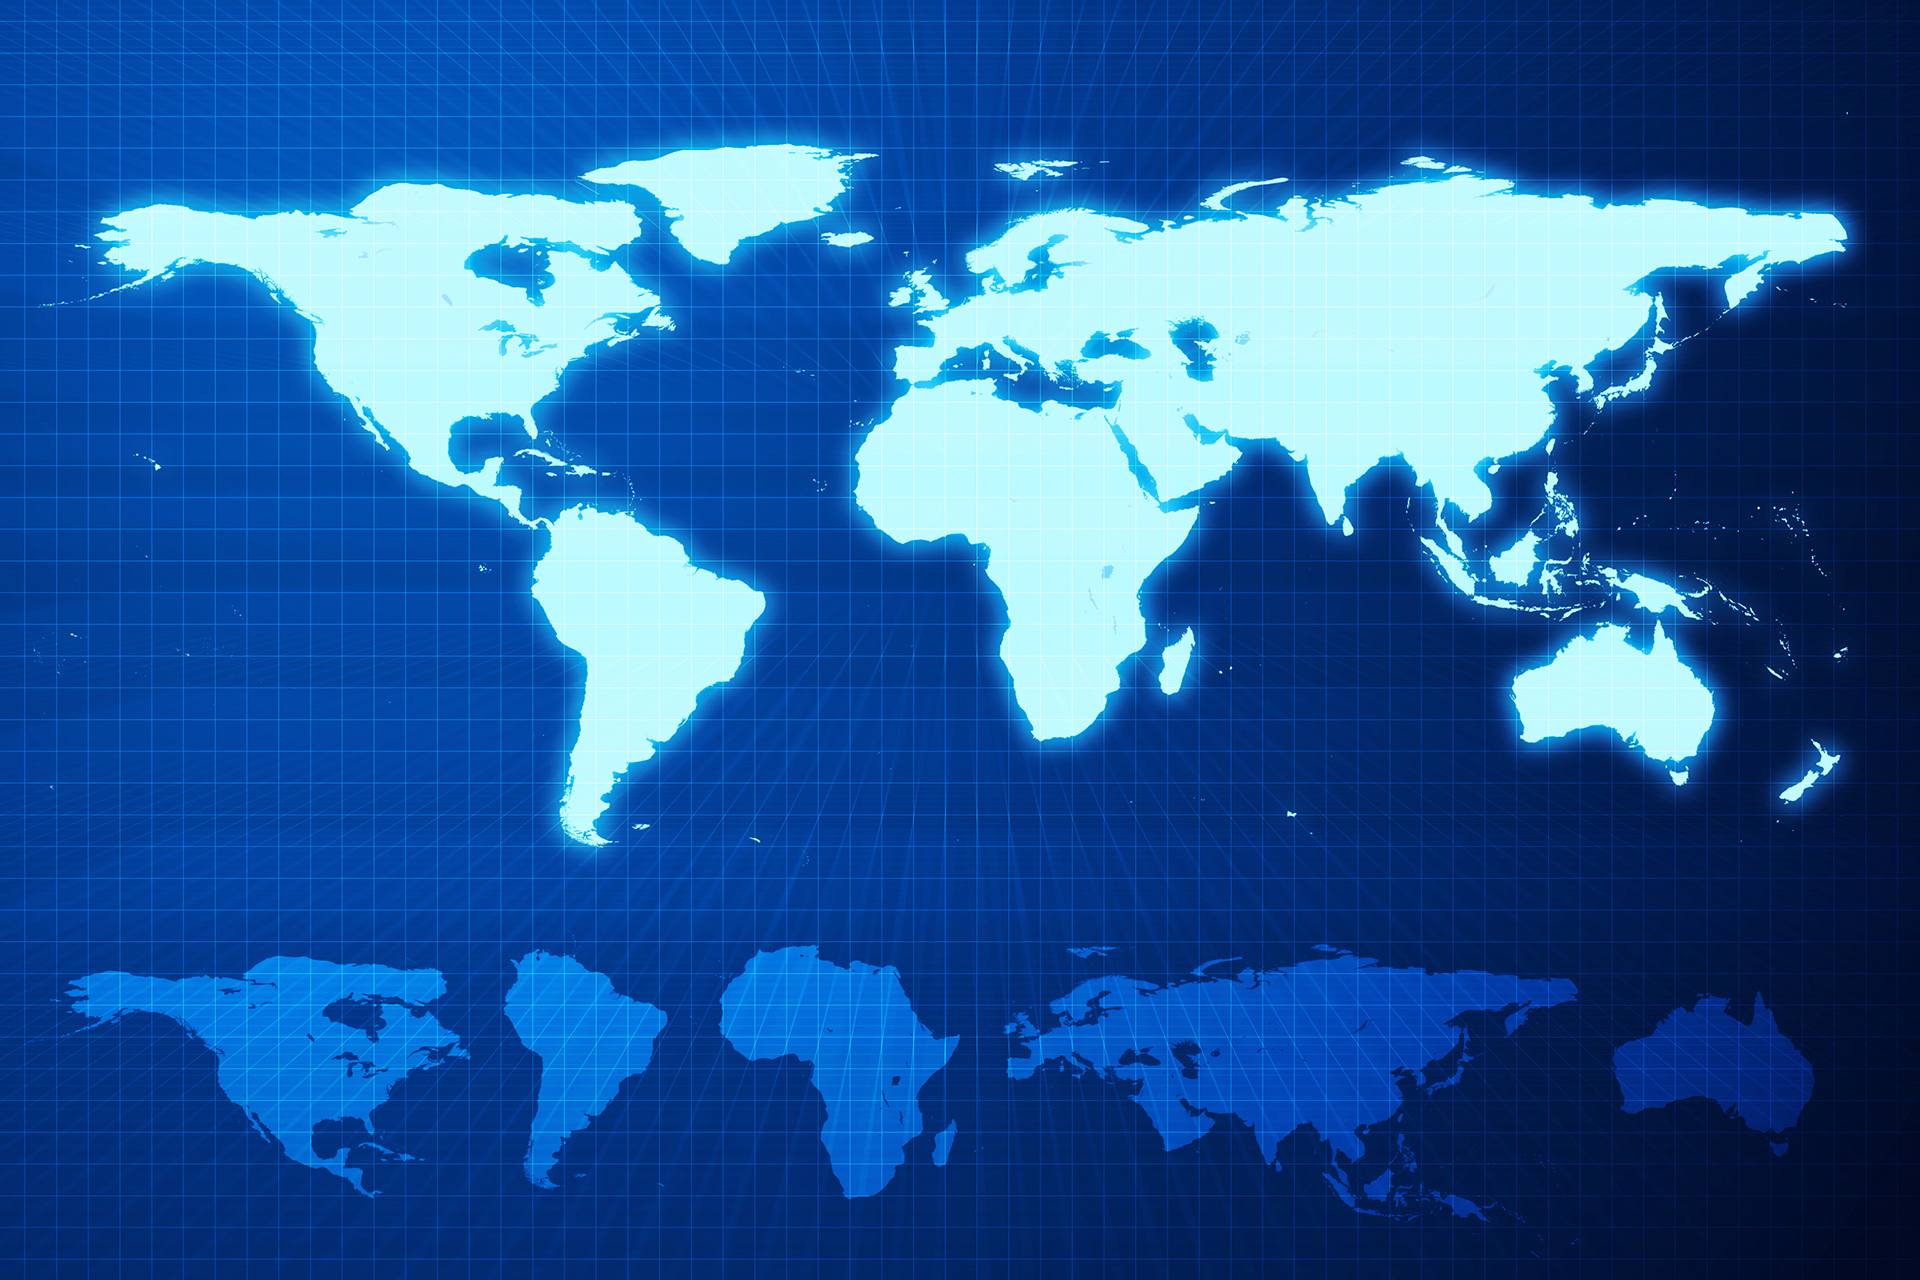 Digital World Map By Hekee On DeviantArt